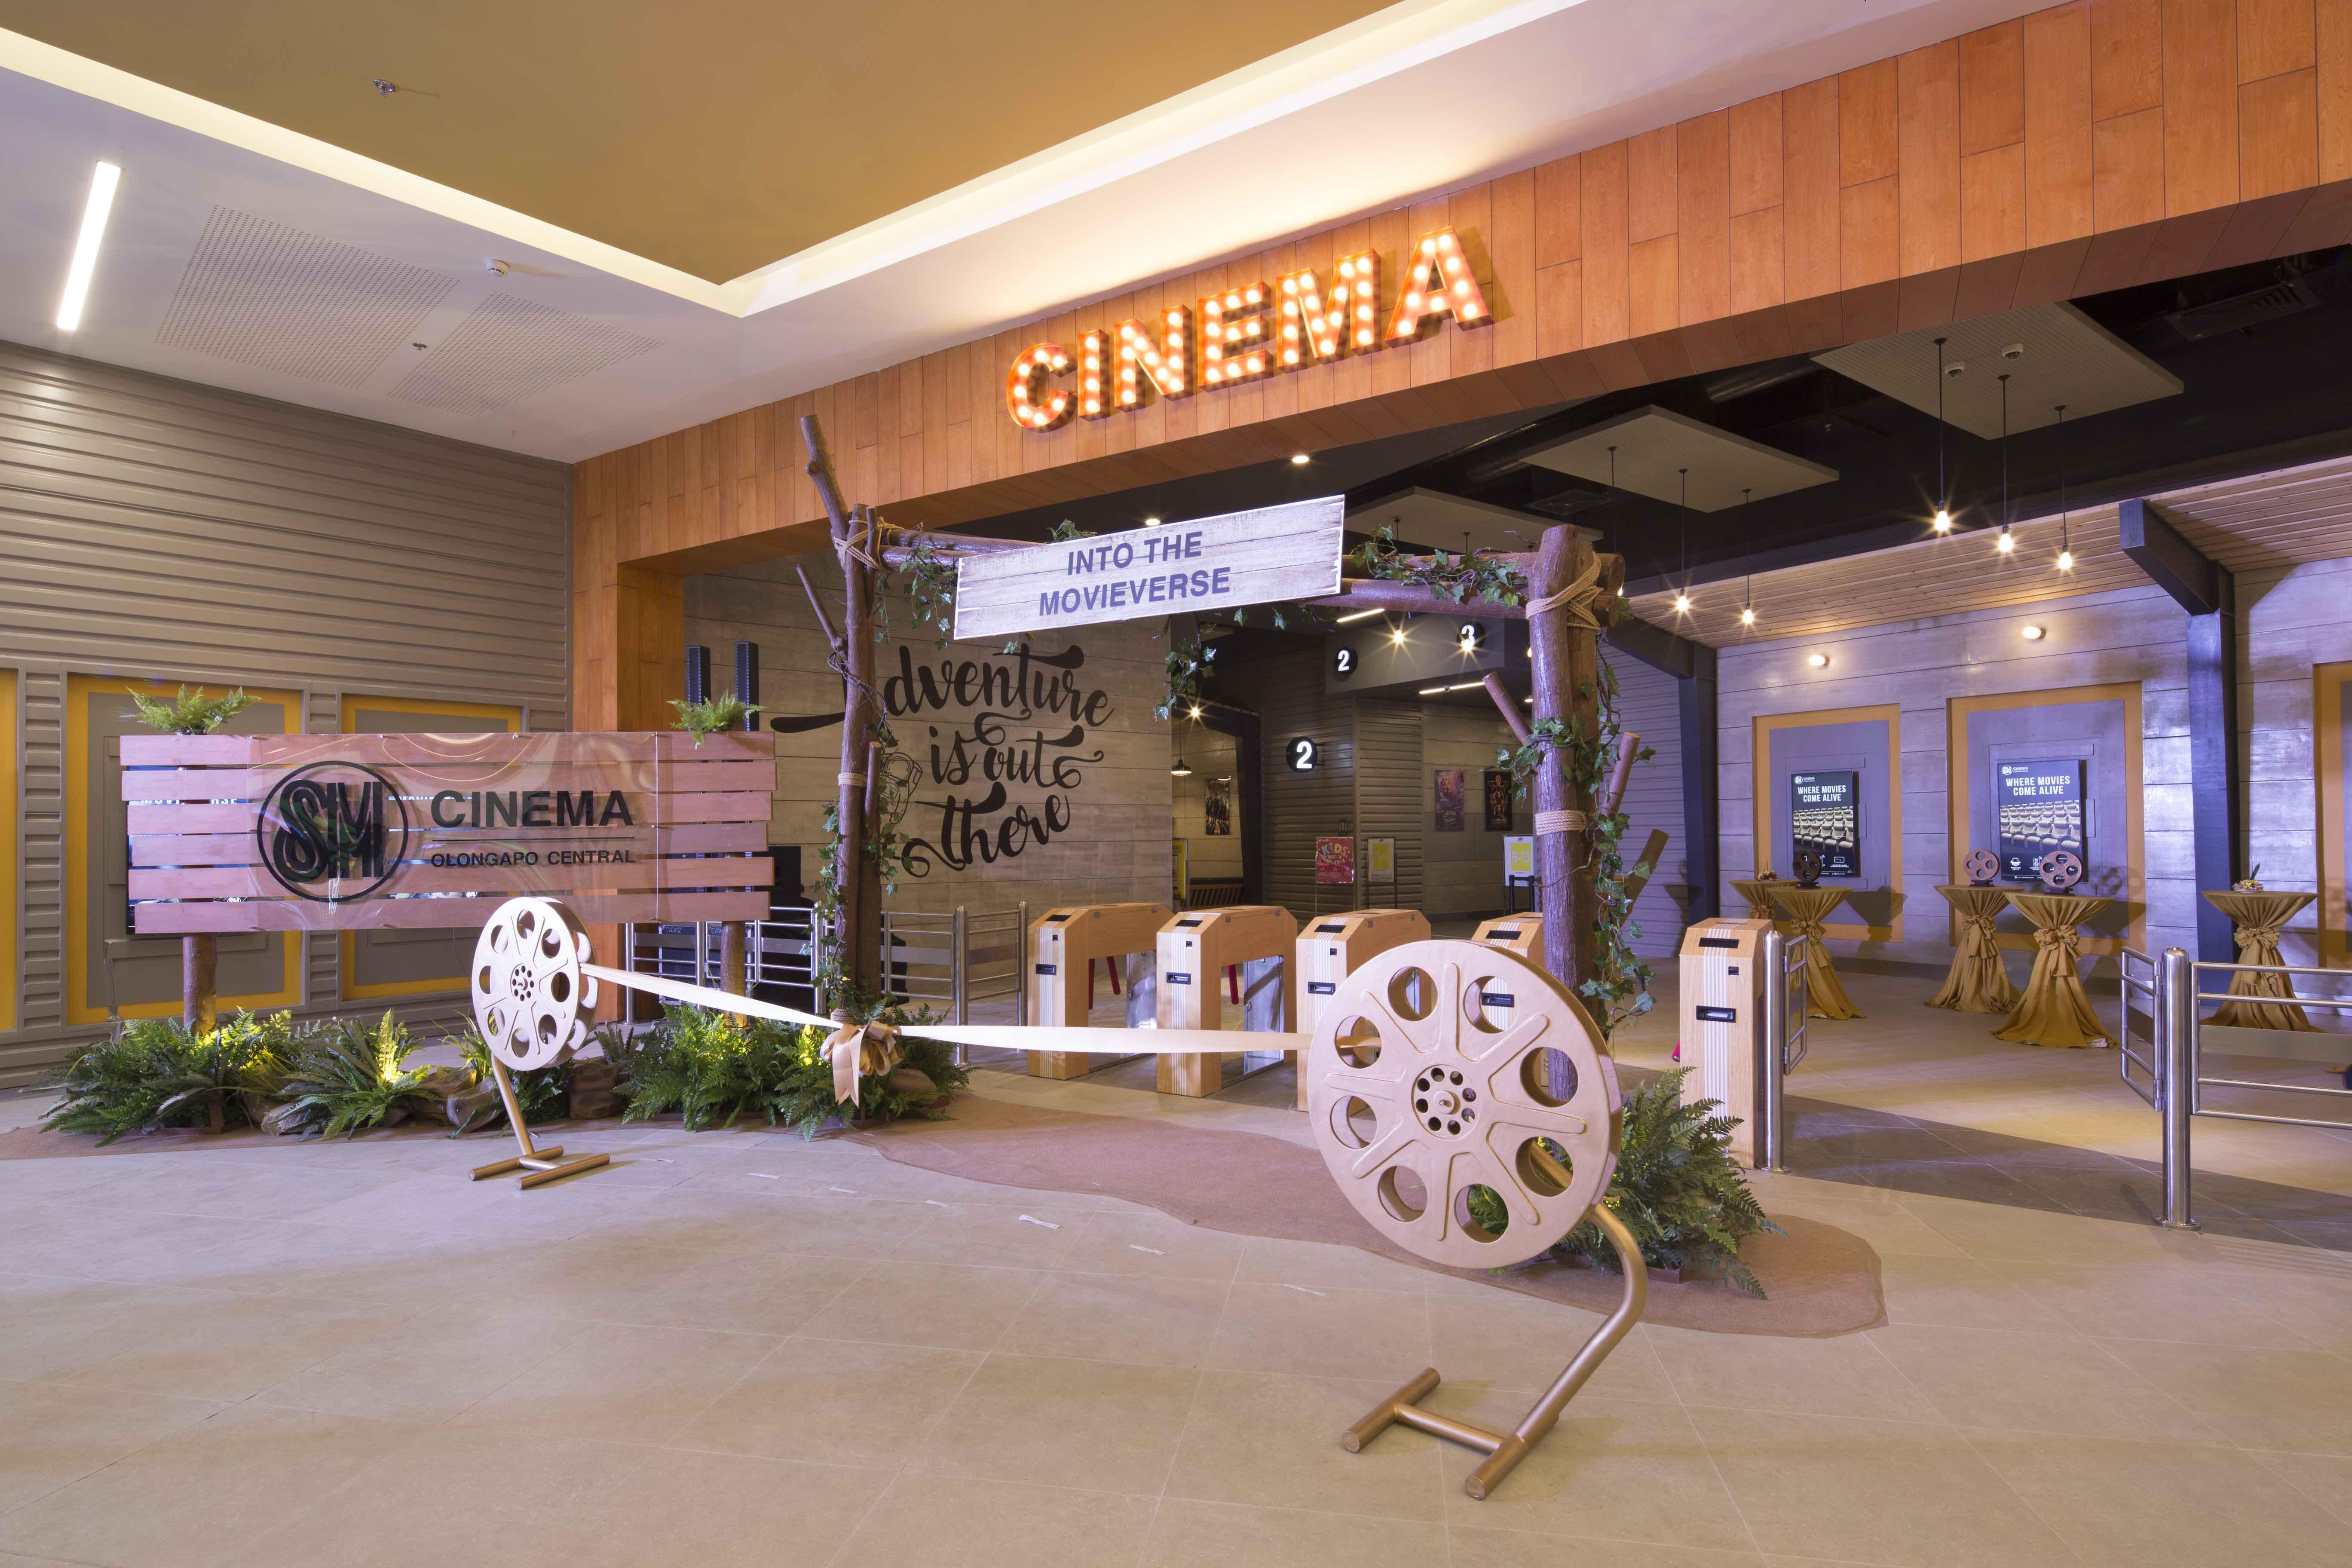 SM Cinema Olongapo Central